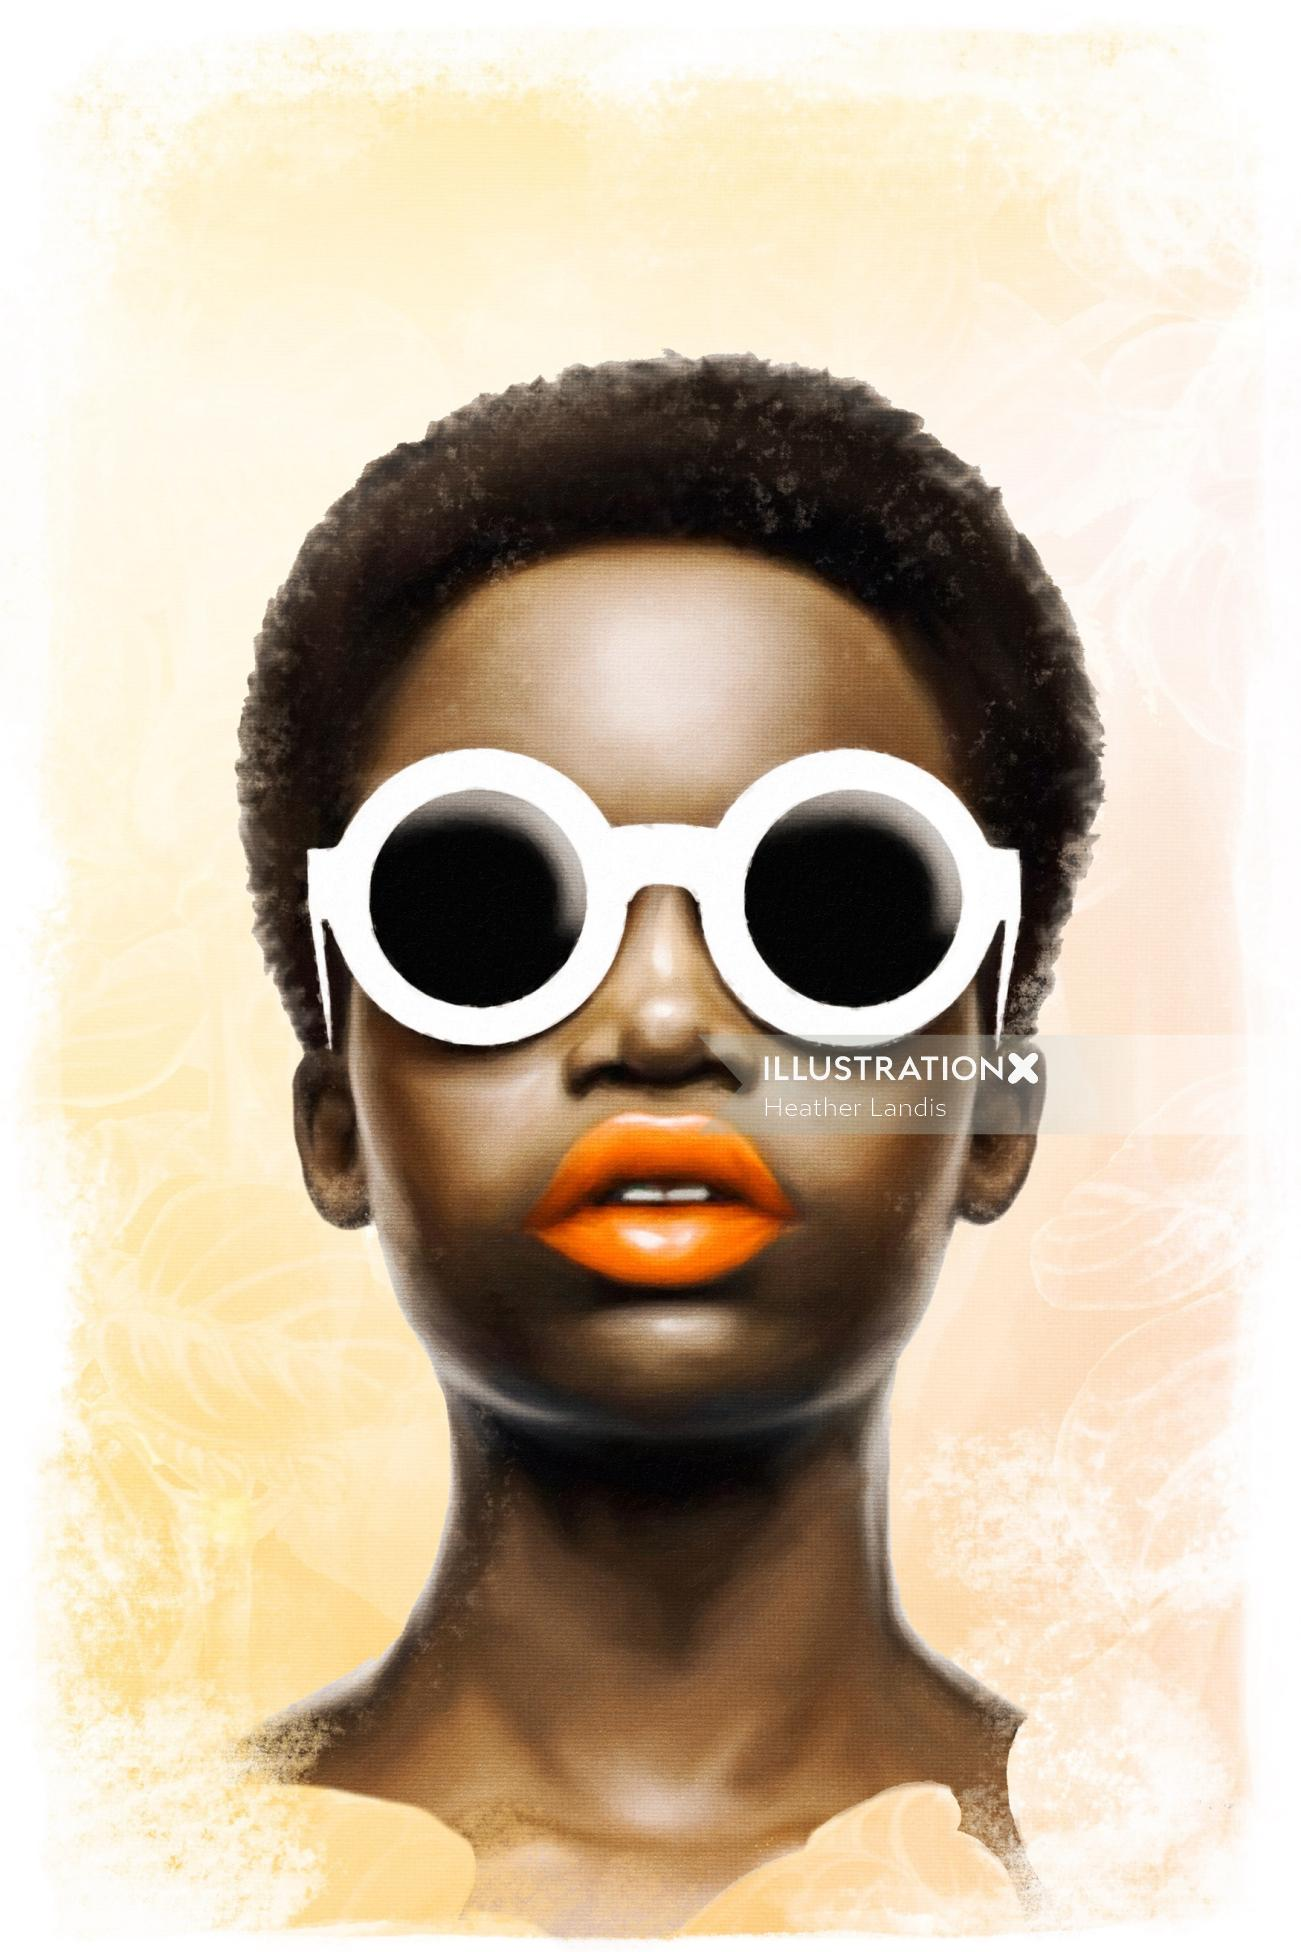 Black american girl portrait art by Heather Landis